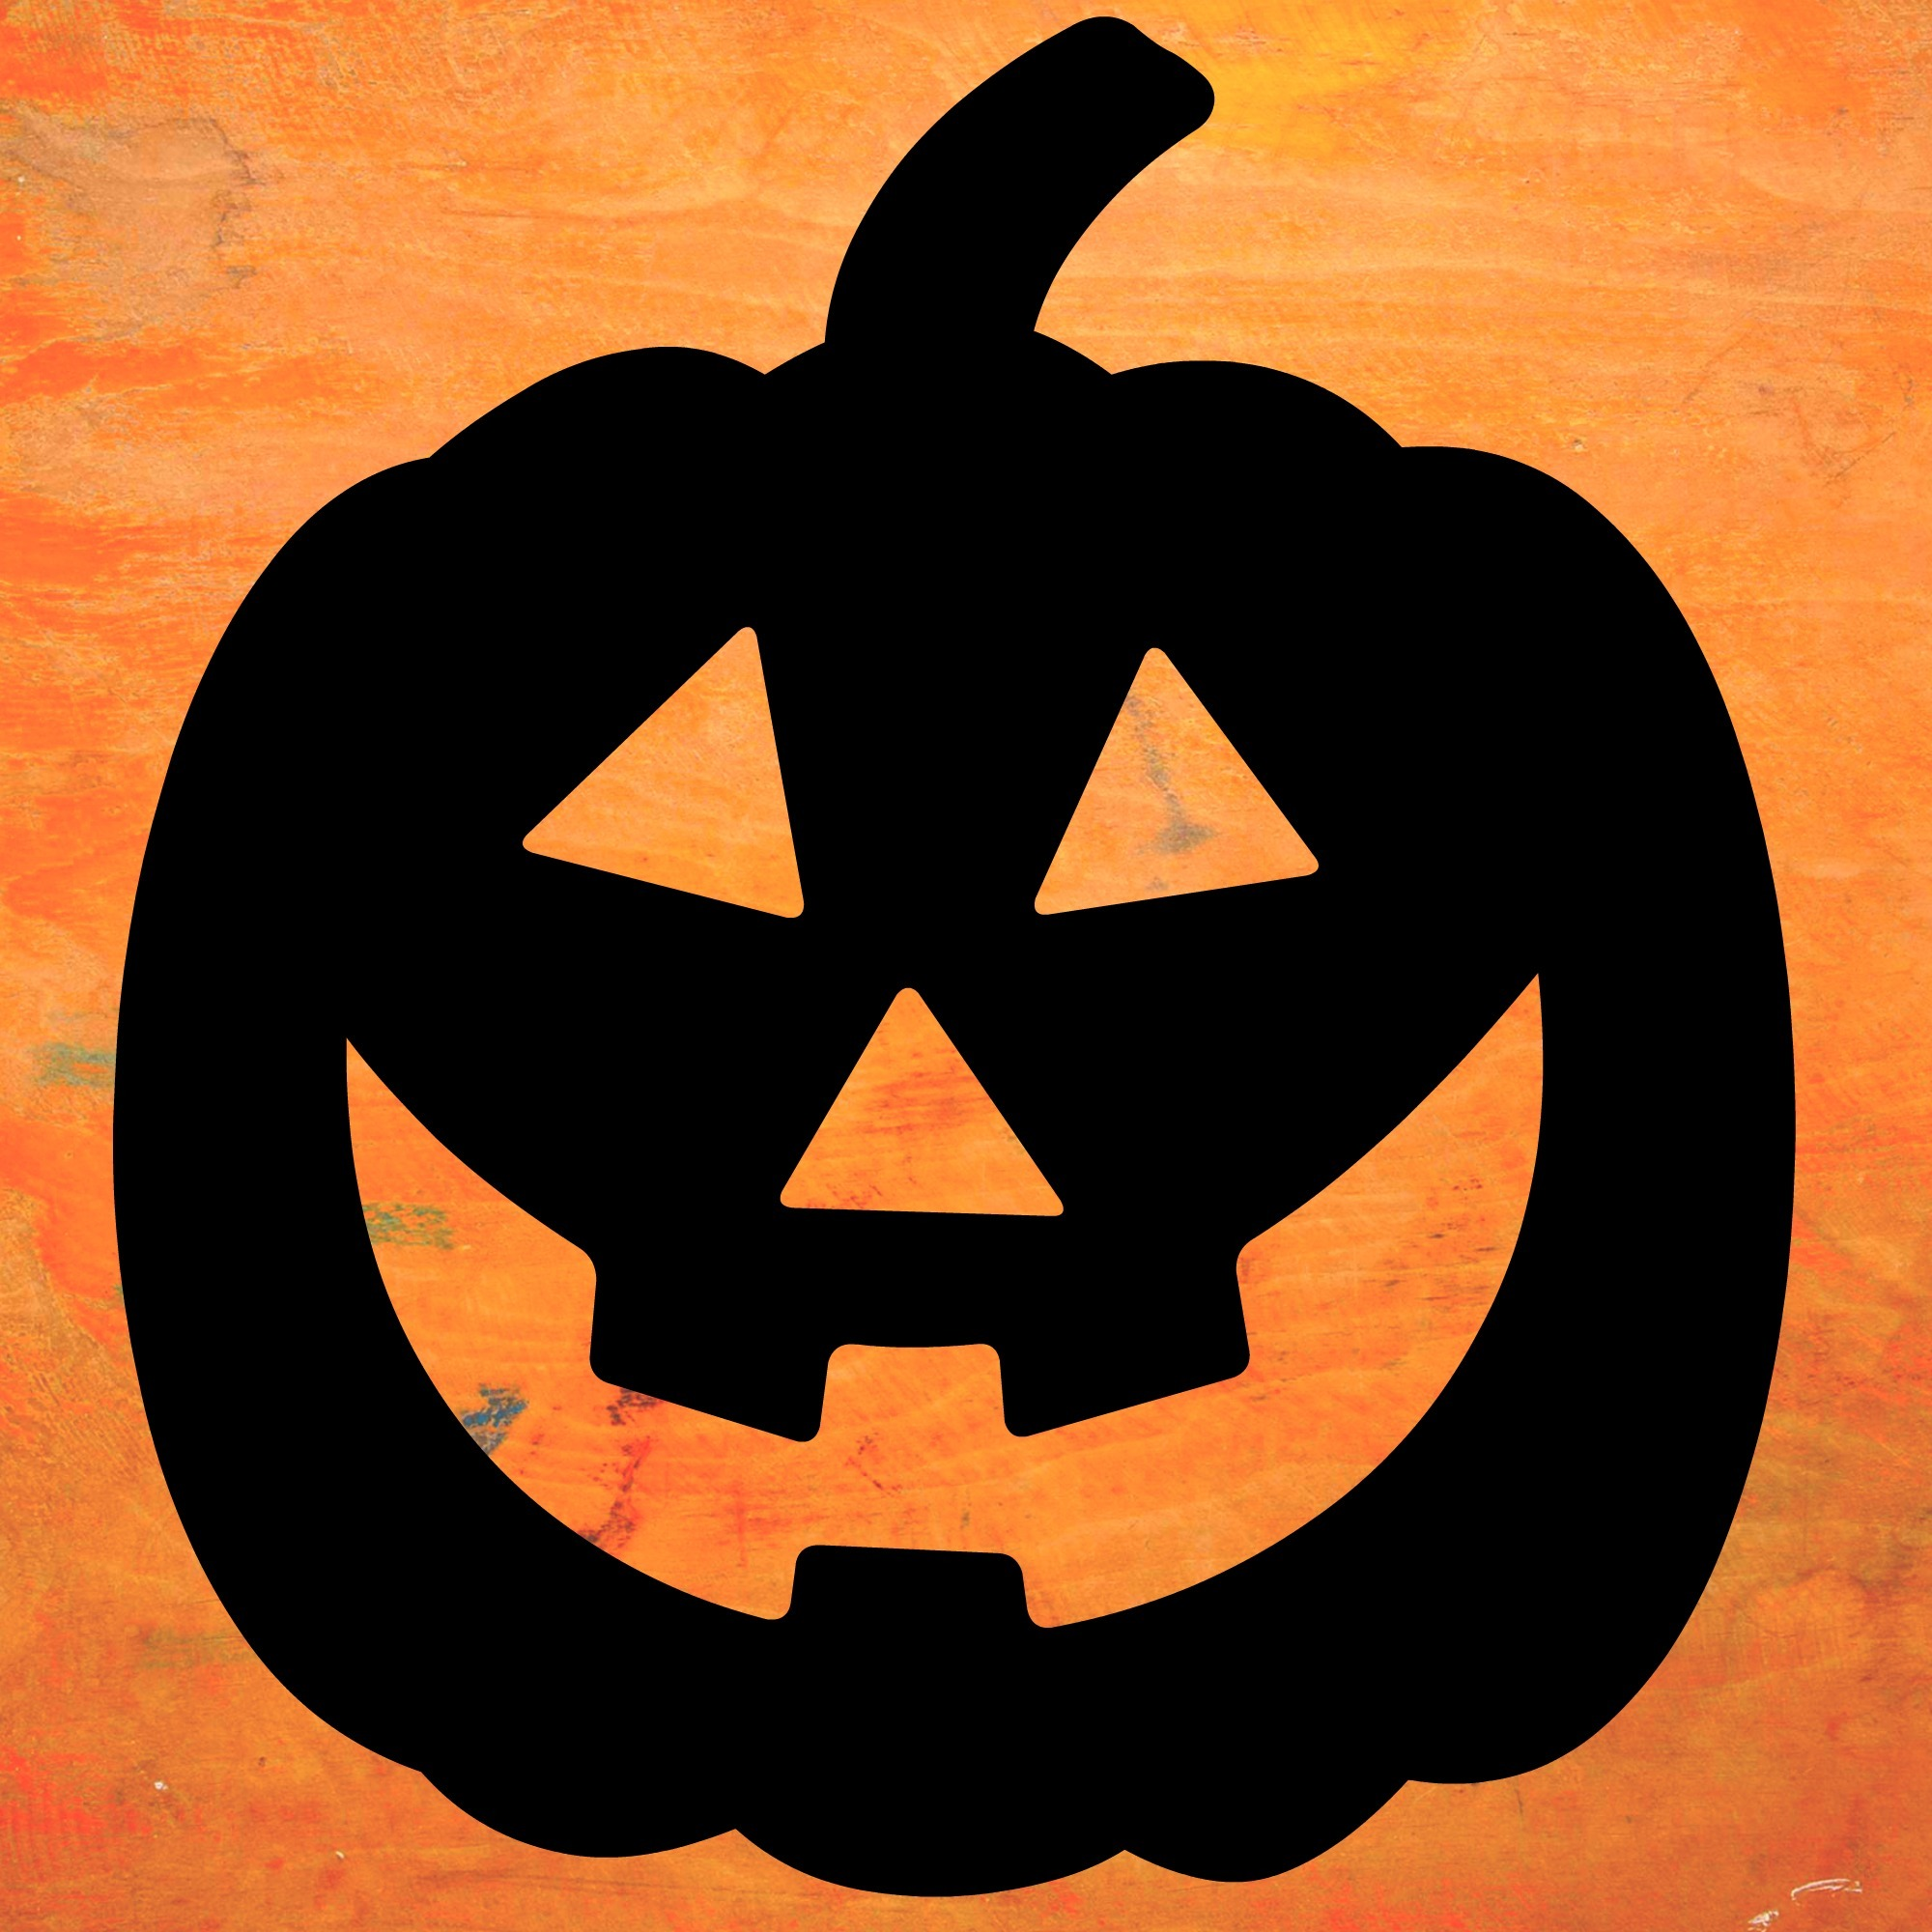 100 halloween fun facts halloween fun facts wanderlust and